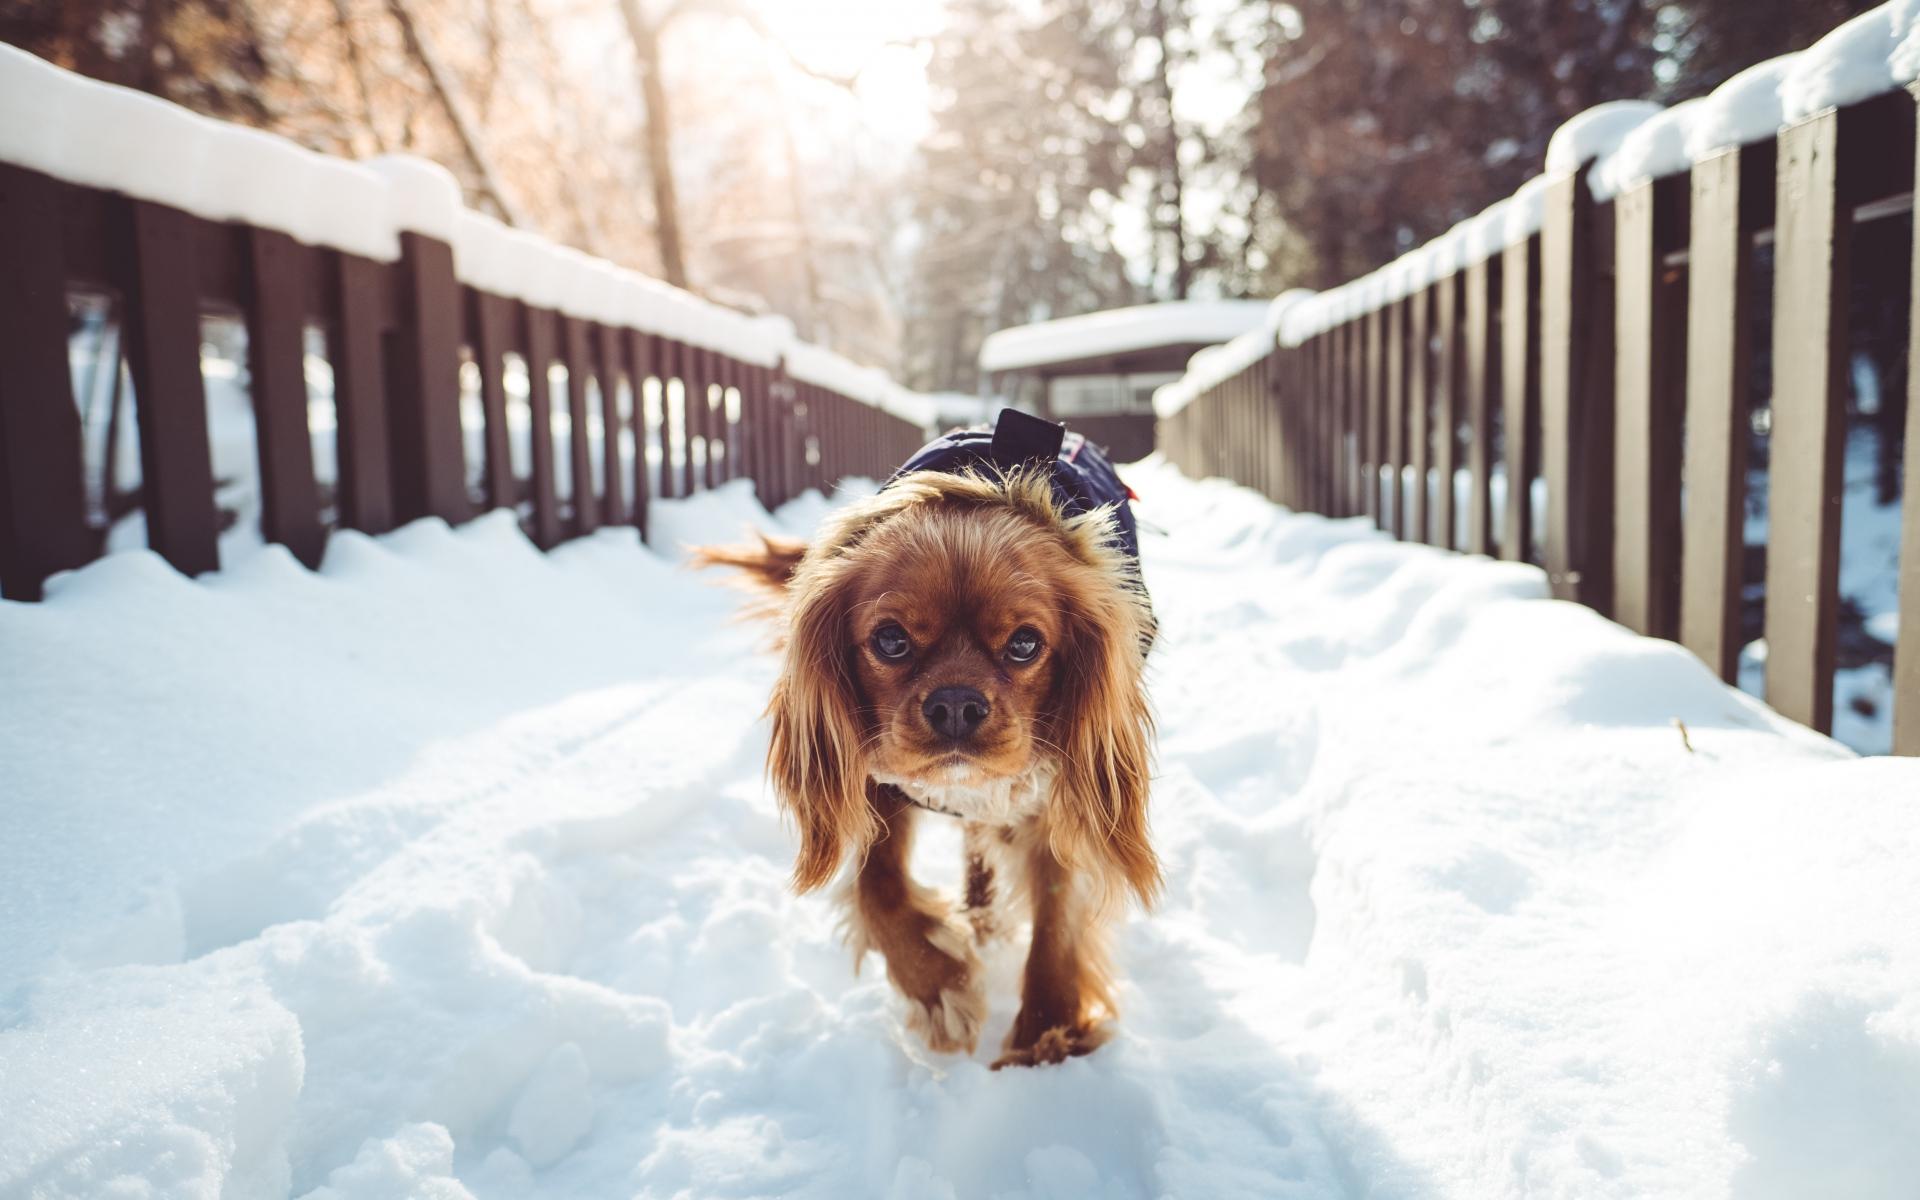 Картинки Собака, ходьба, зима фото и обои на рабочий стол